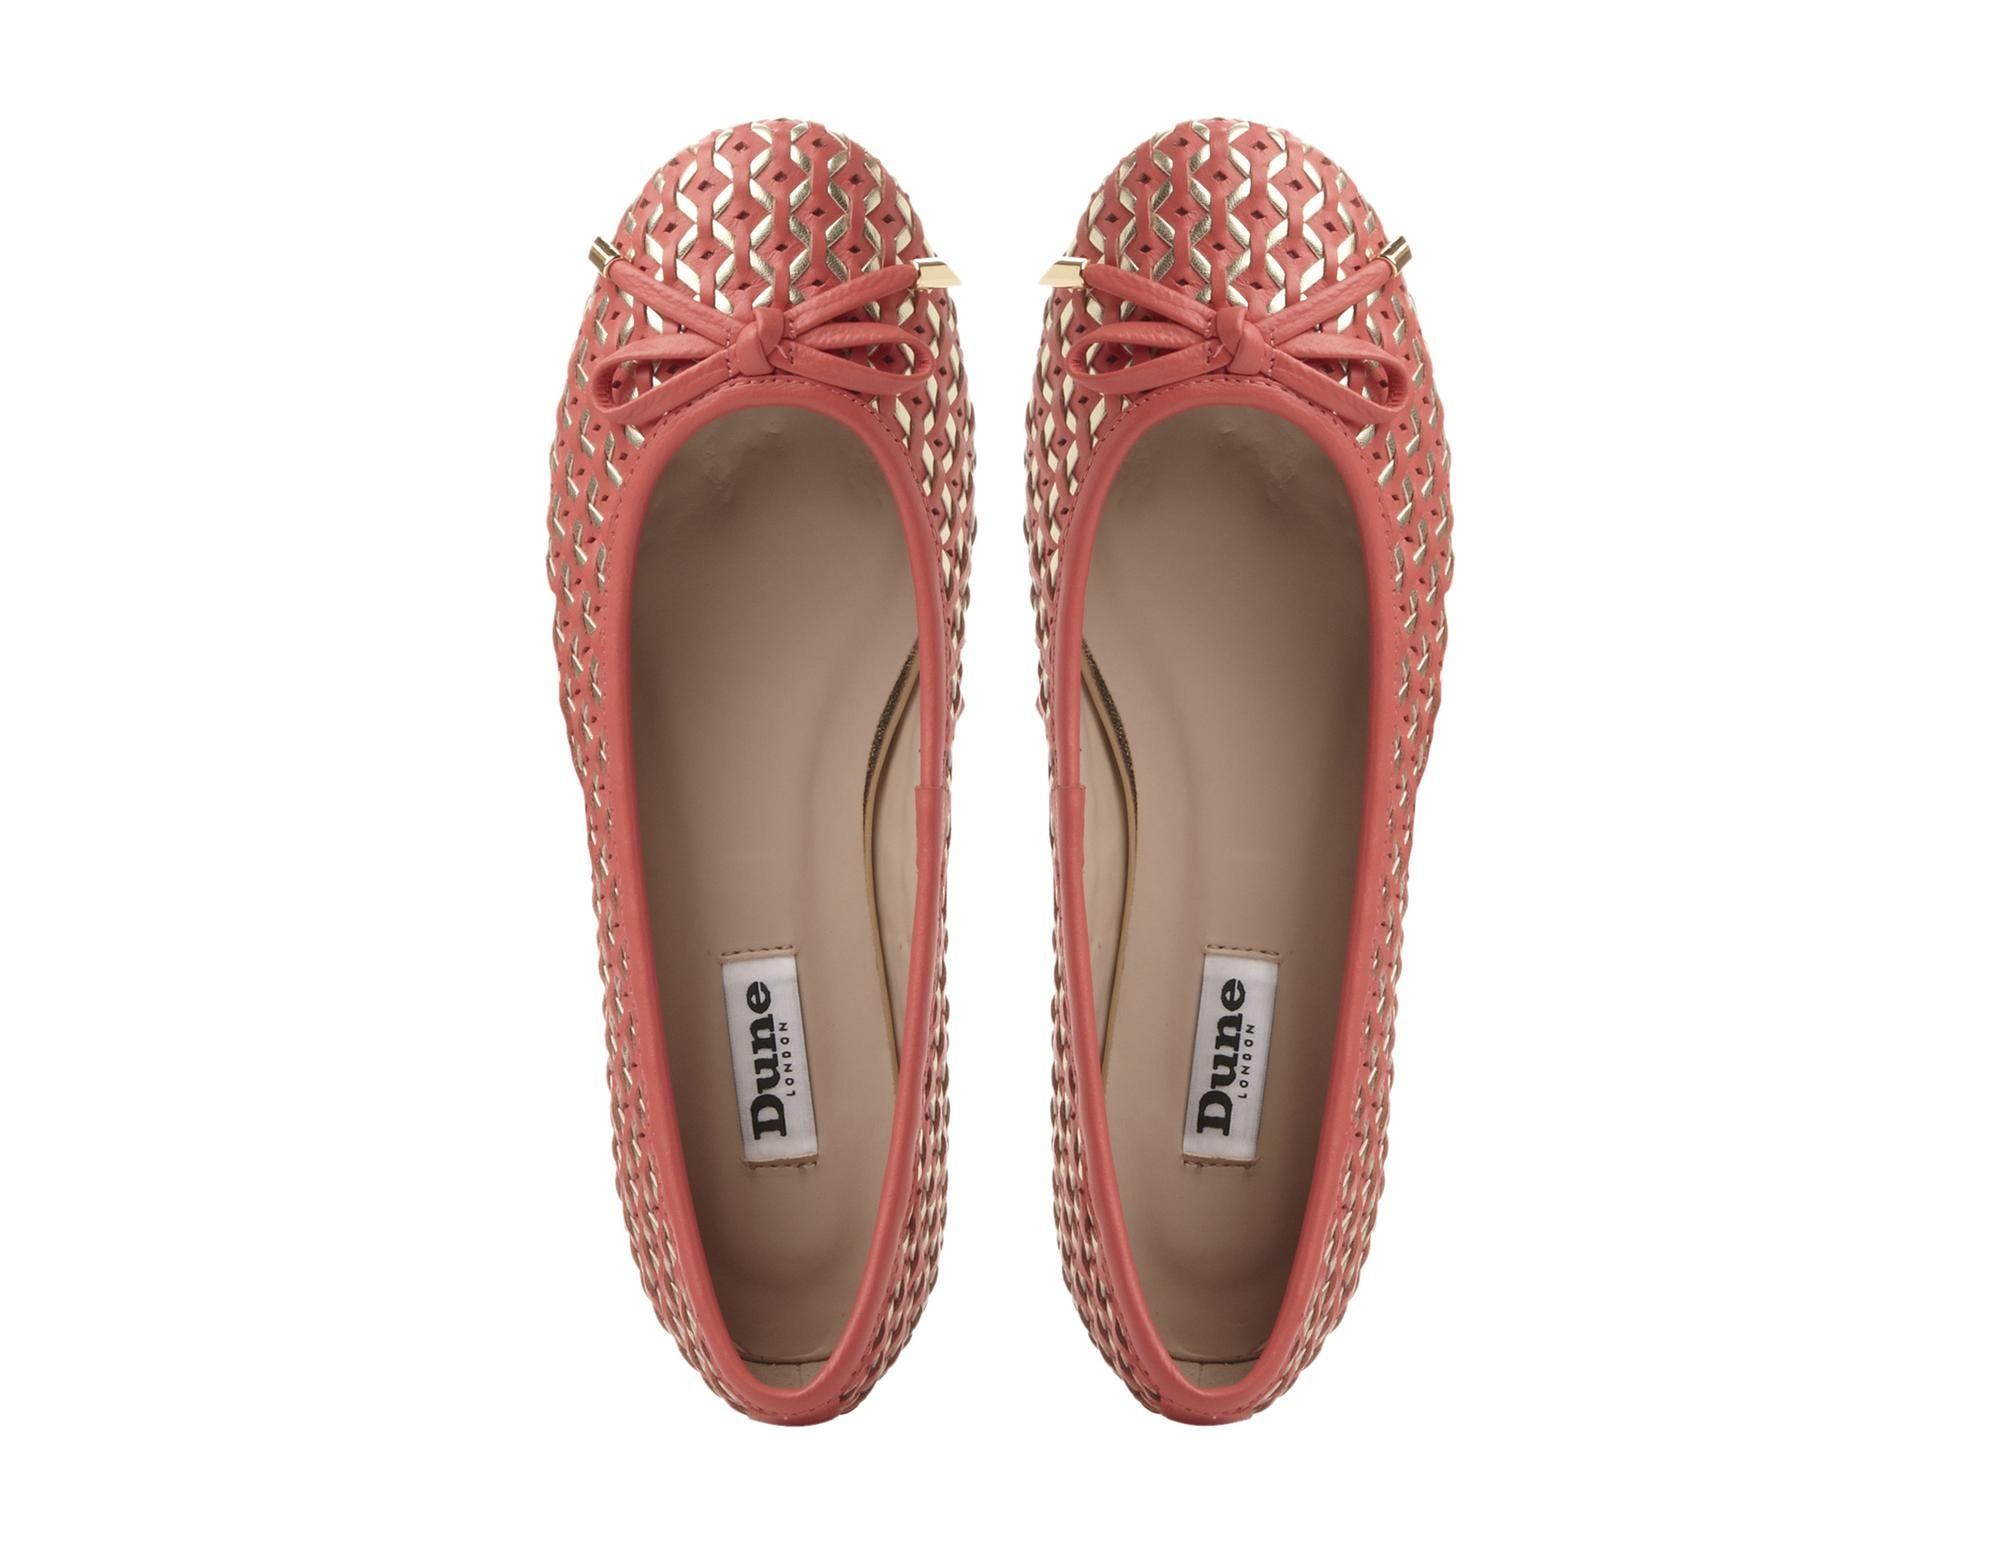 Ballerina shoes, Dune shoes